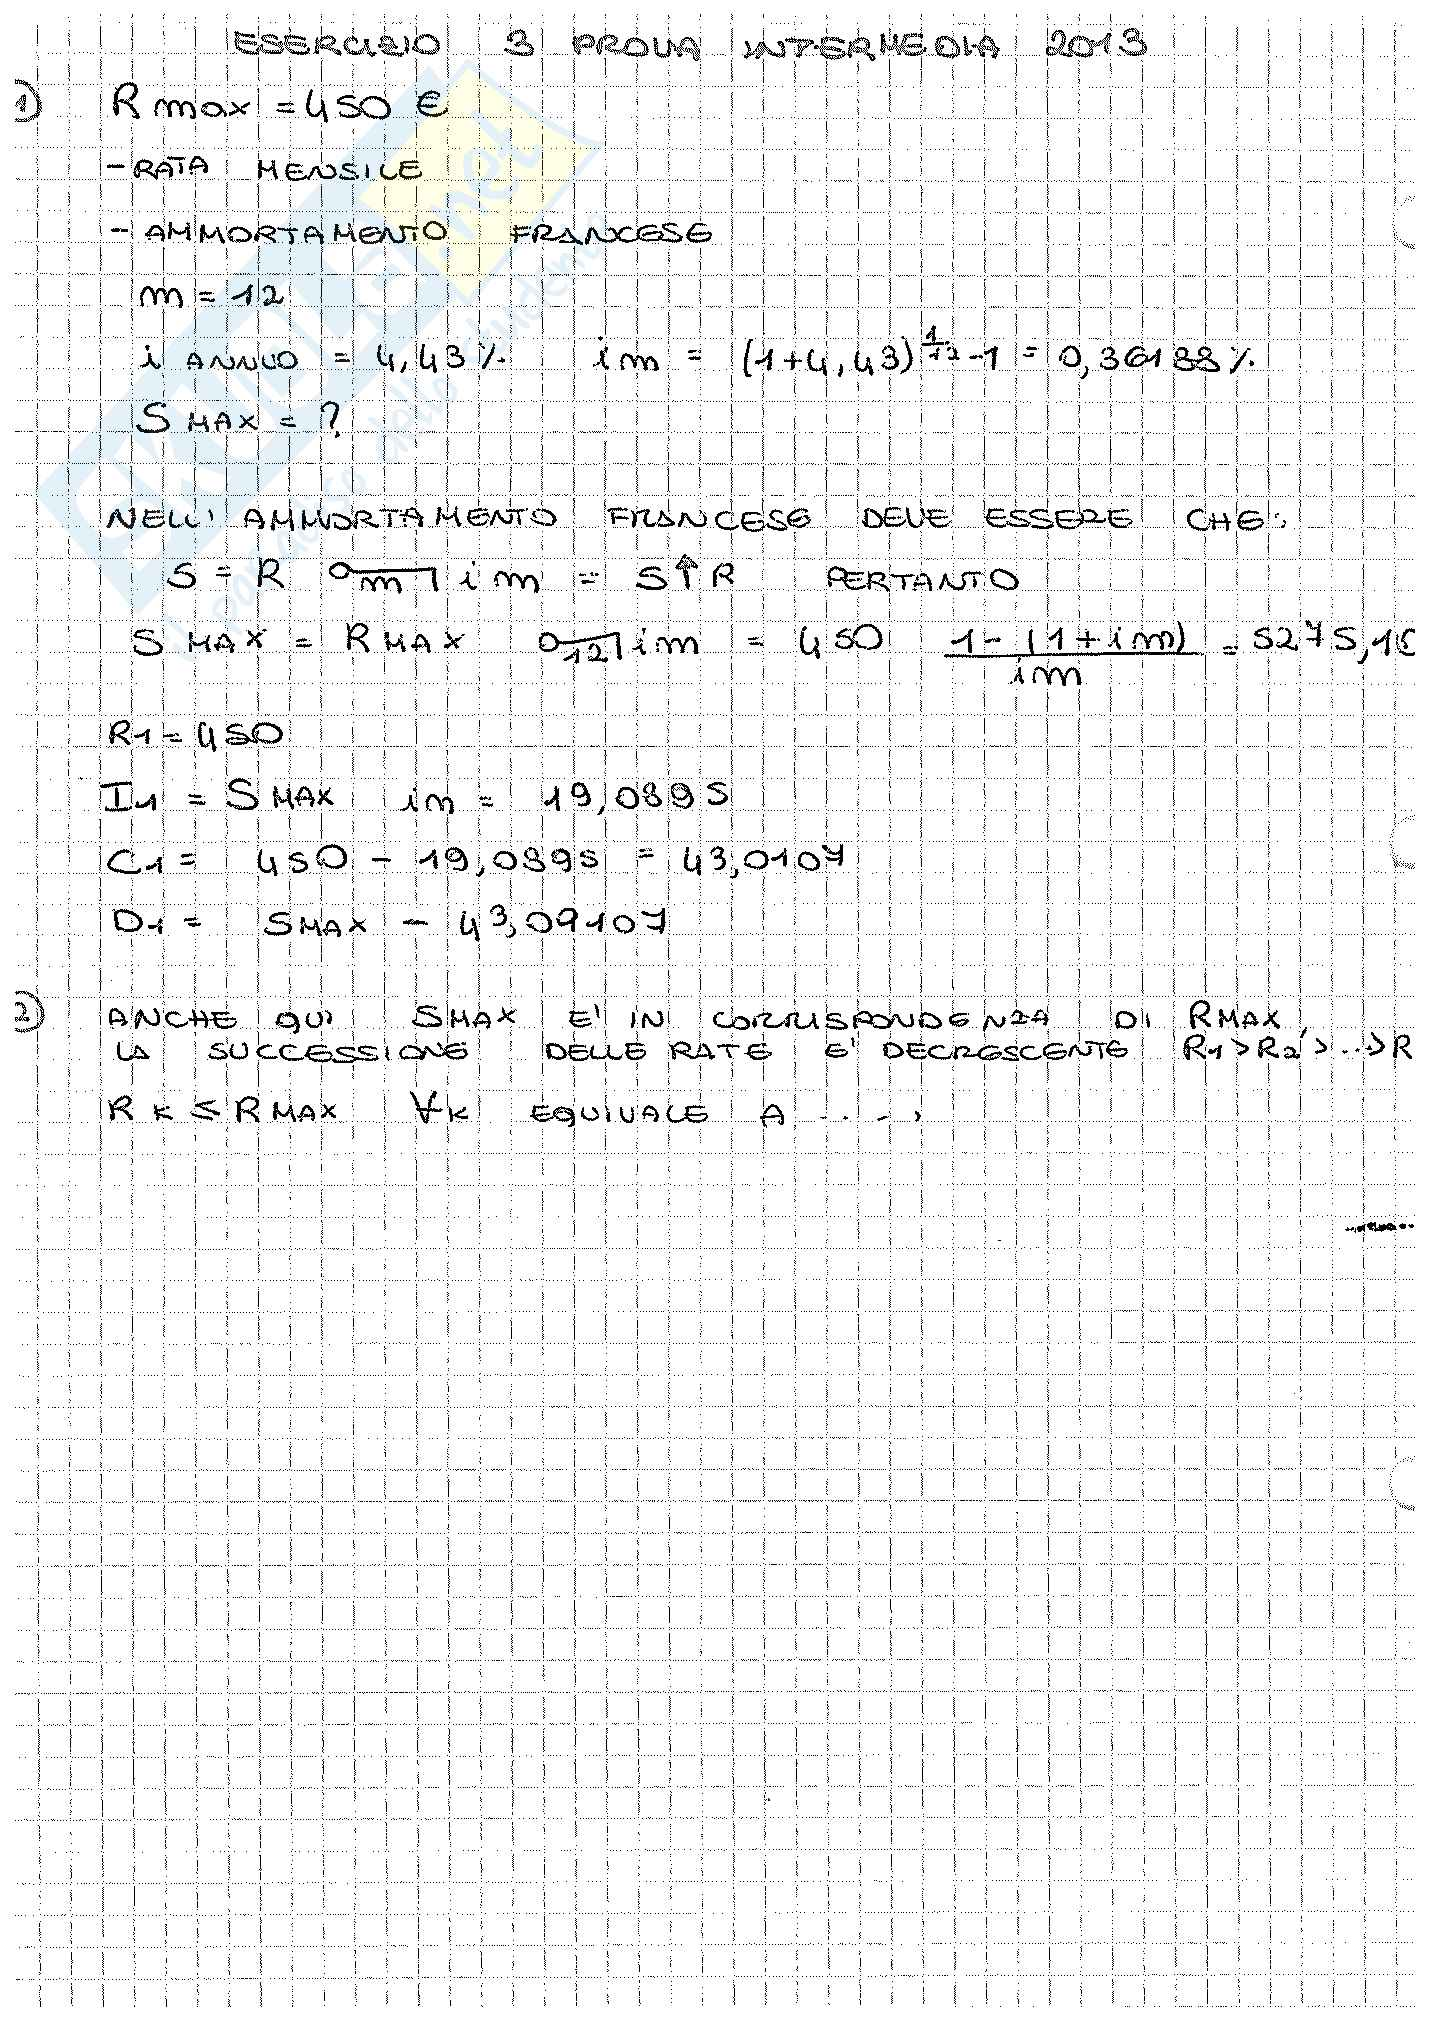 Appunti di Matematica Finanziaria, docente Claudio Pacati Pag. 46